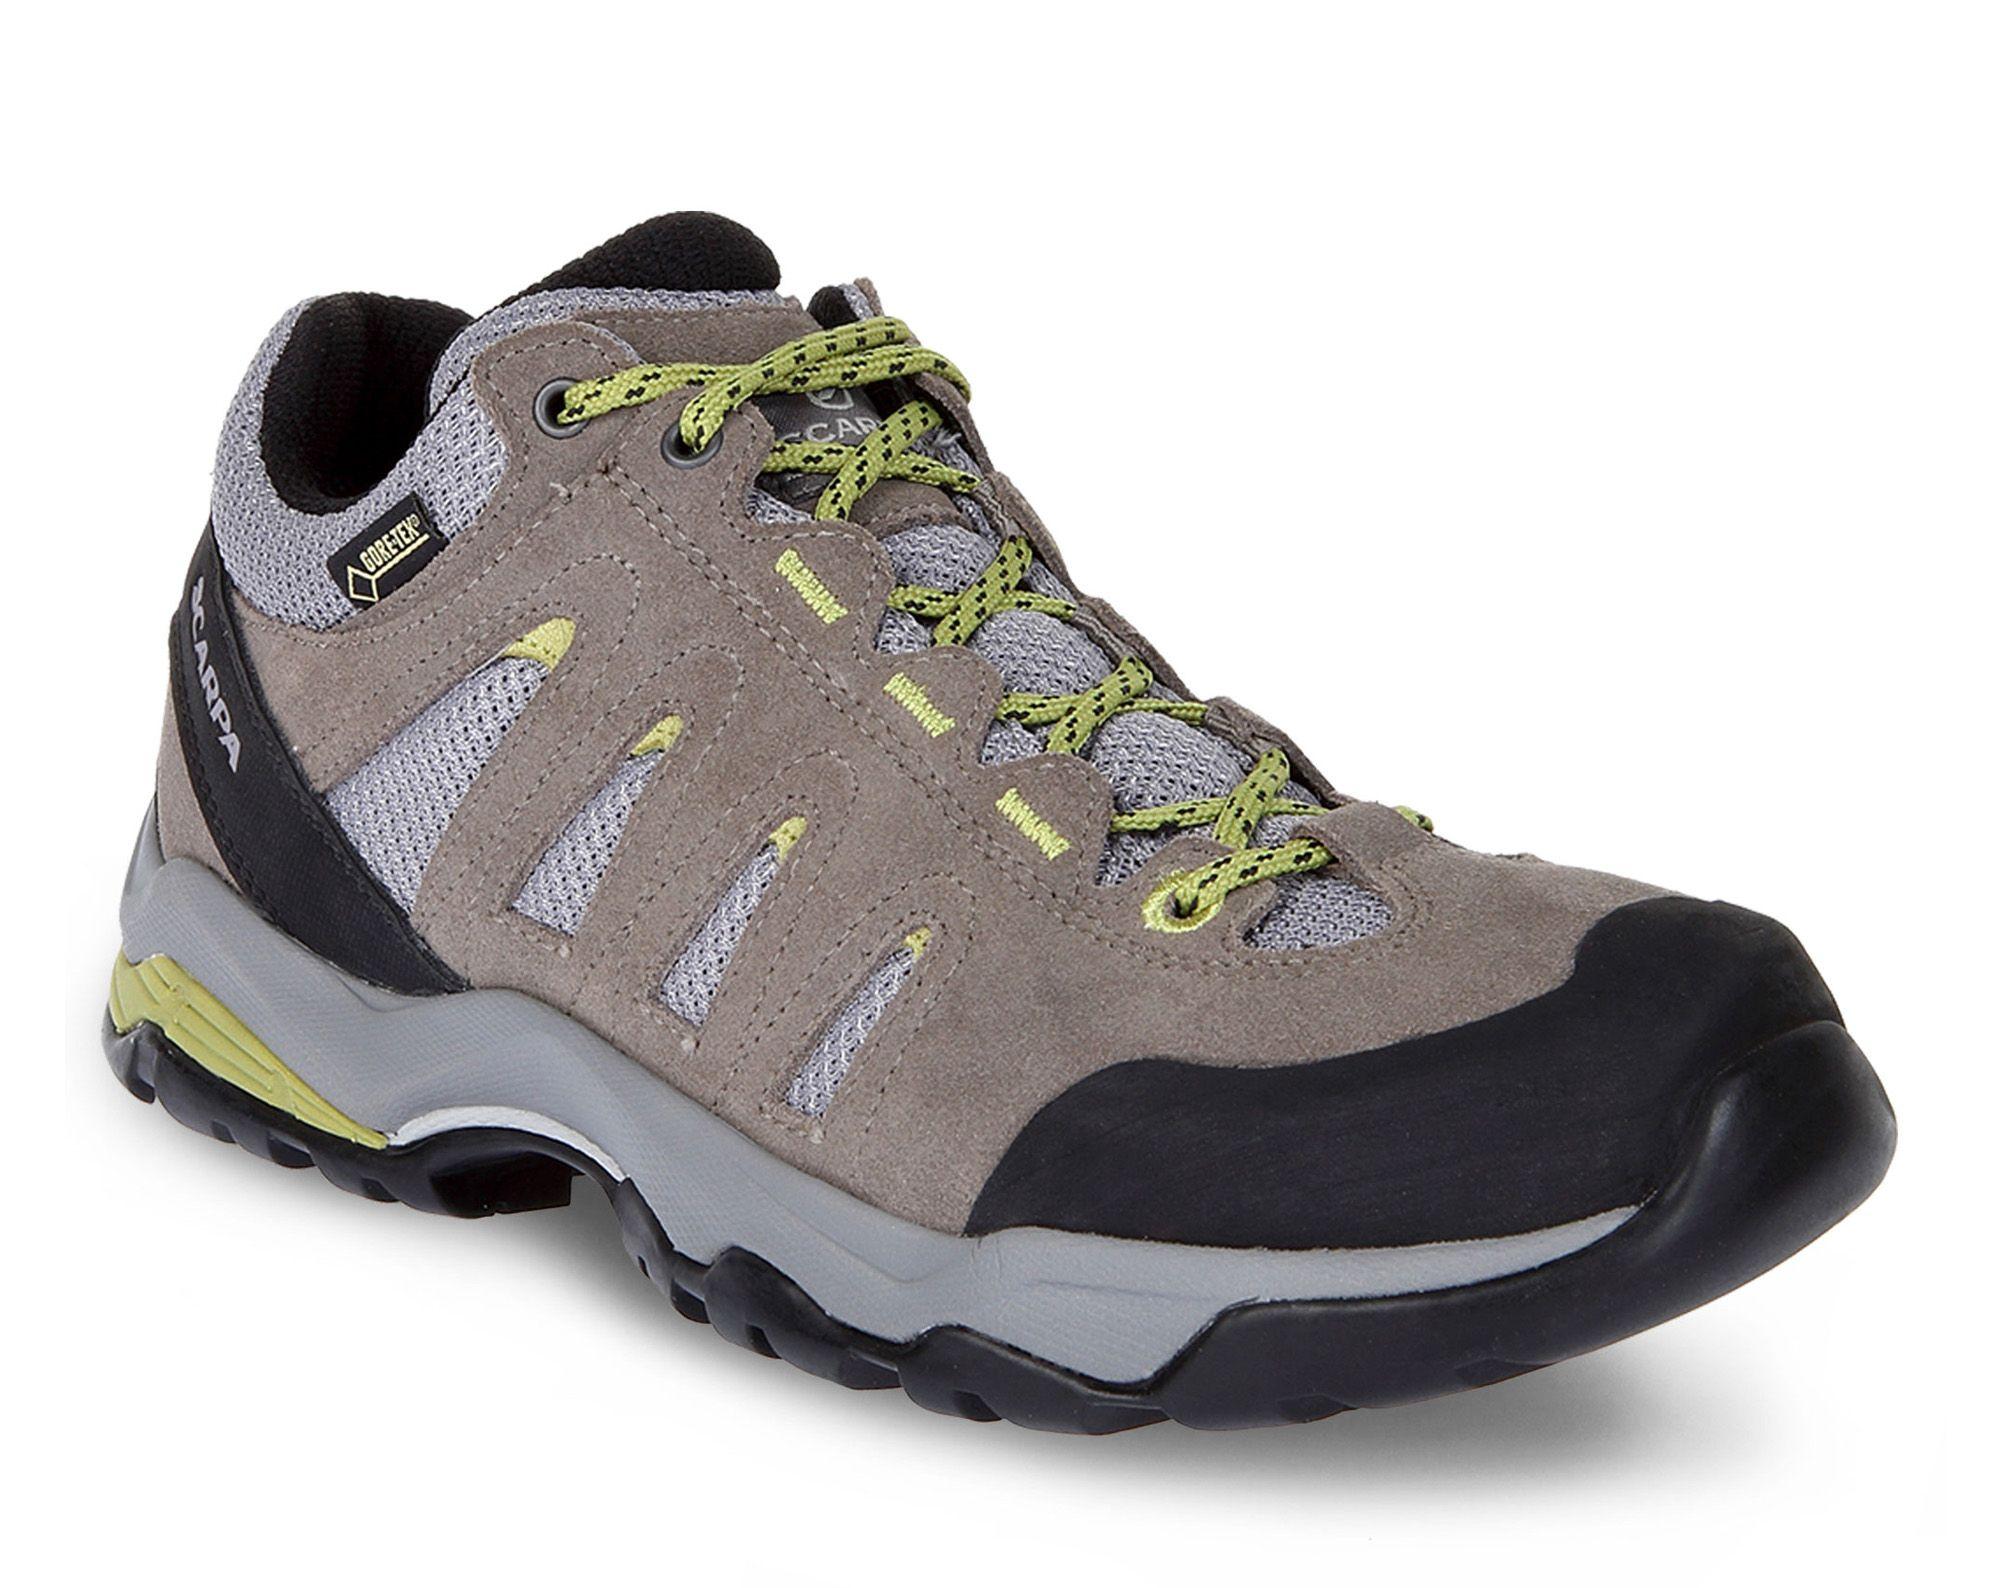 cda20783771c Scarpa Moraine GTX Hiking Shoe - Women s 63082 202-TauCel-39.5